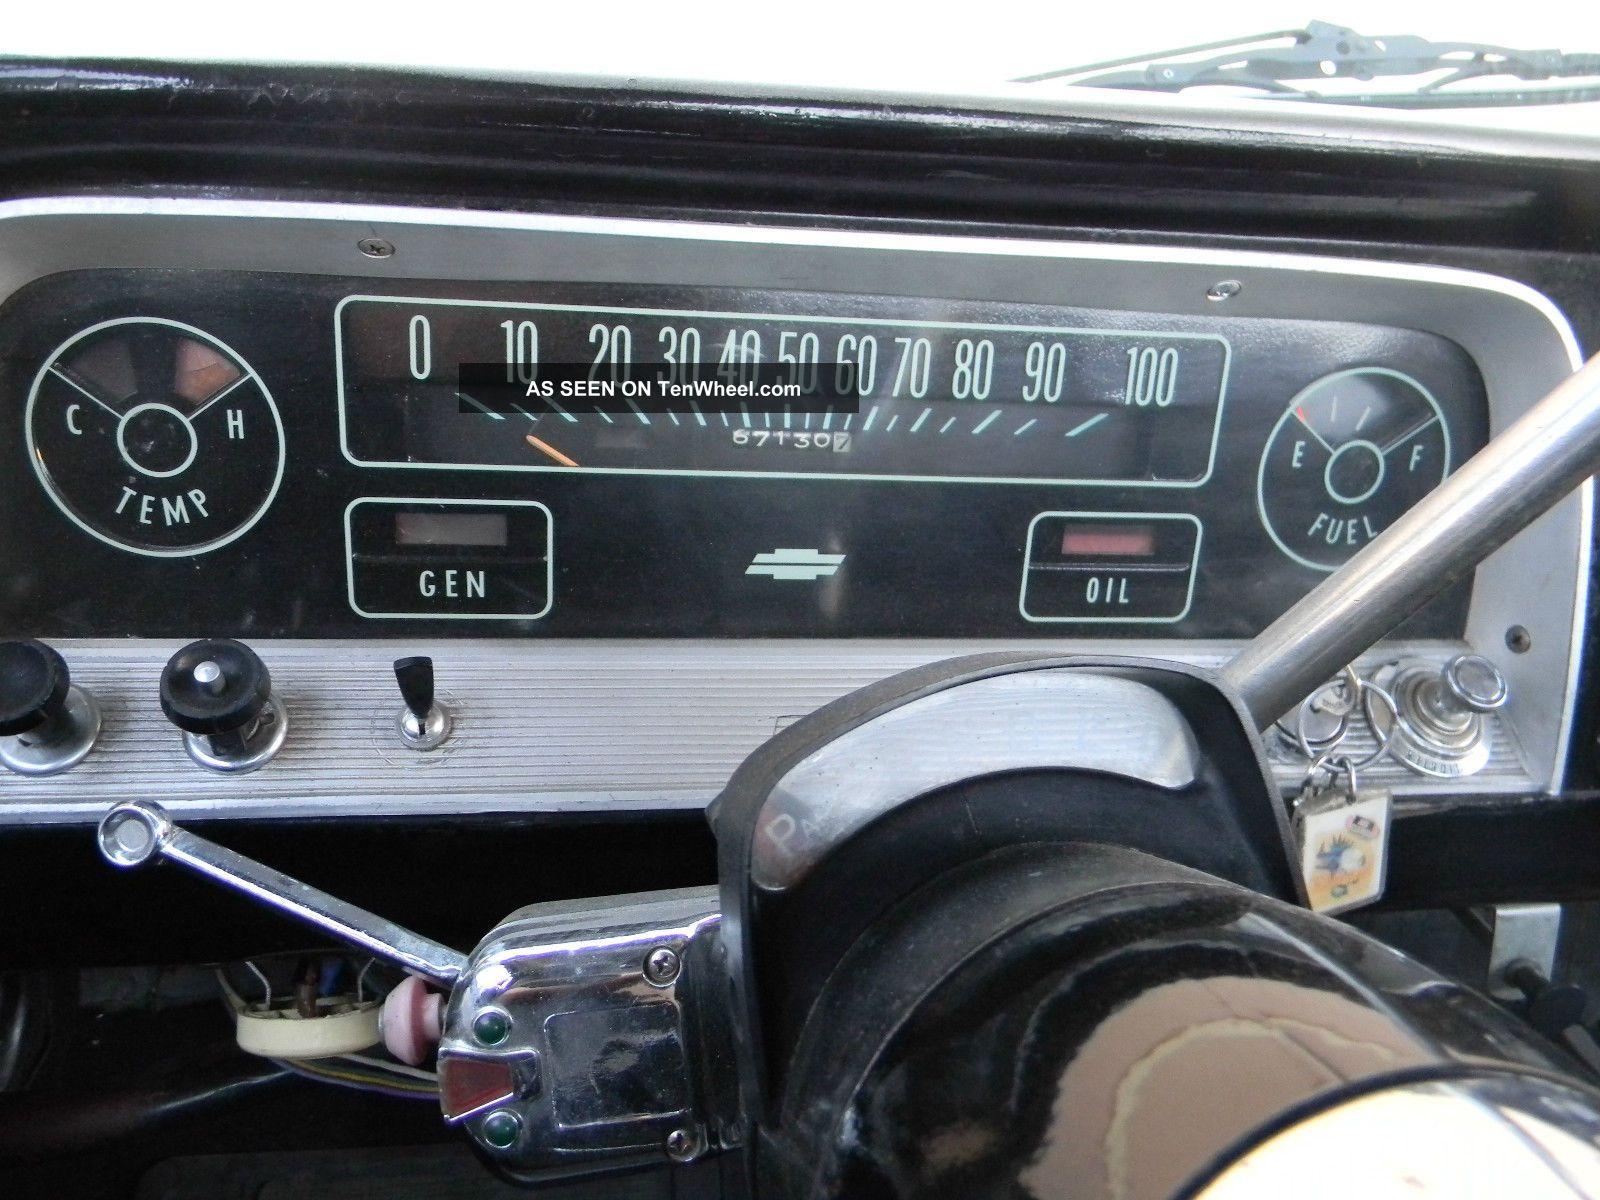 1966 Chevy C10 Truck Short Bed C14 V8 66 65 64 67 Hot Rod Rat Custom Shortbed C 10